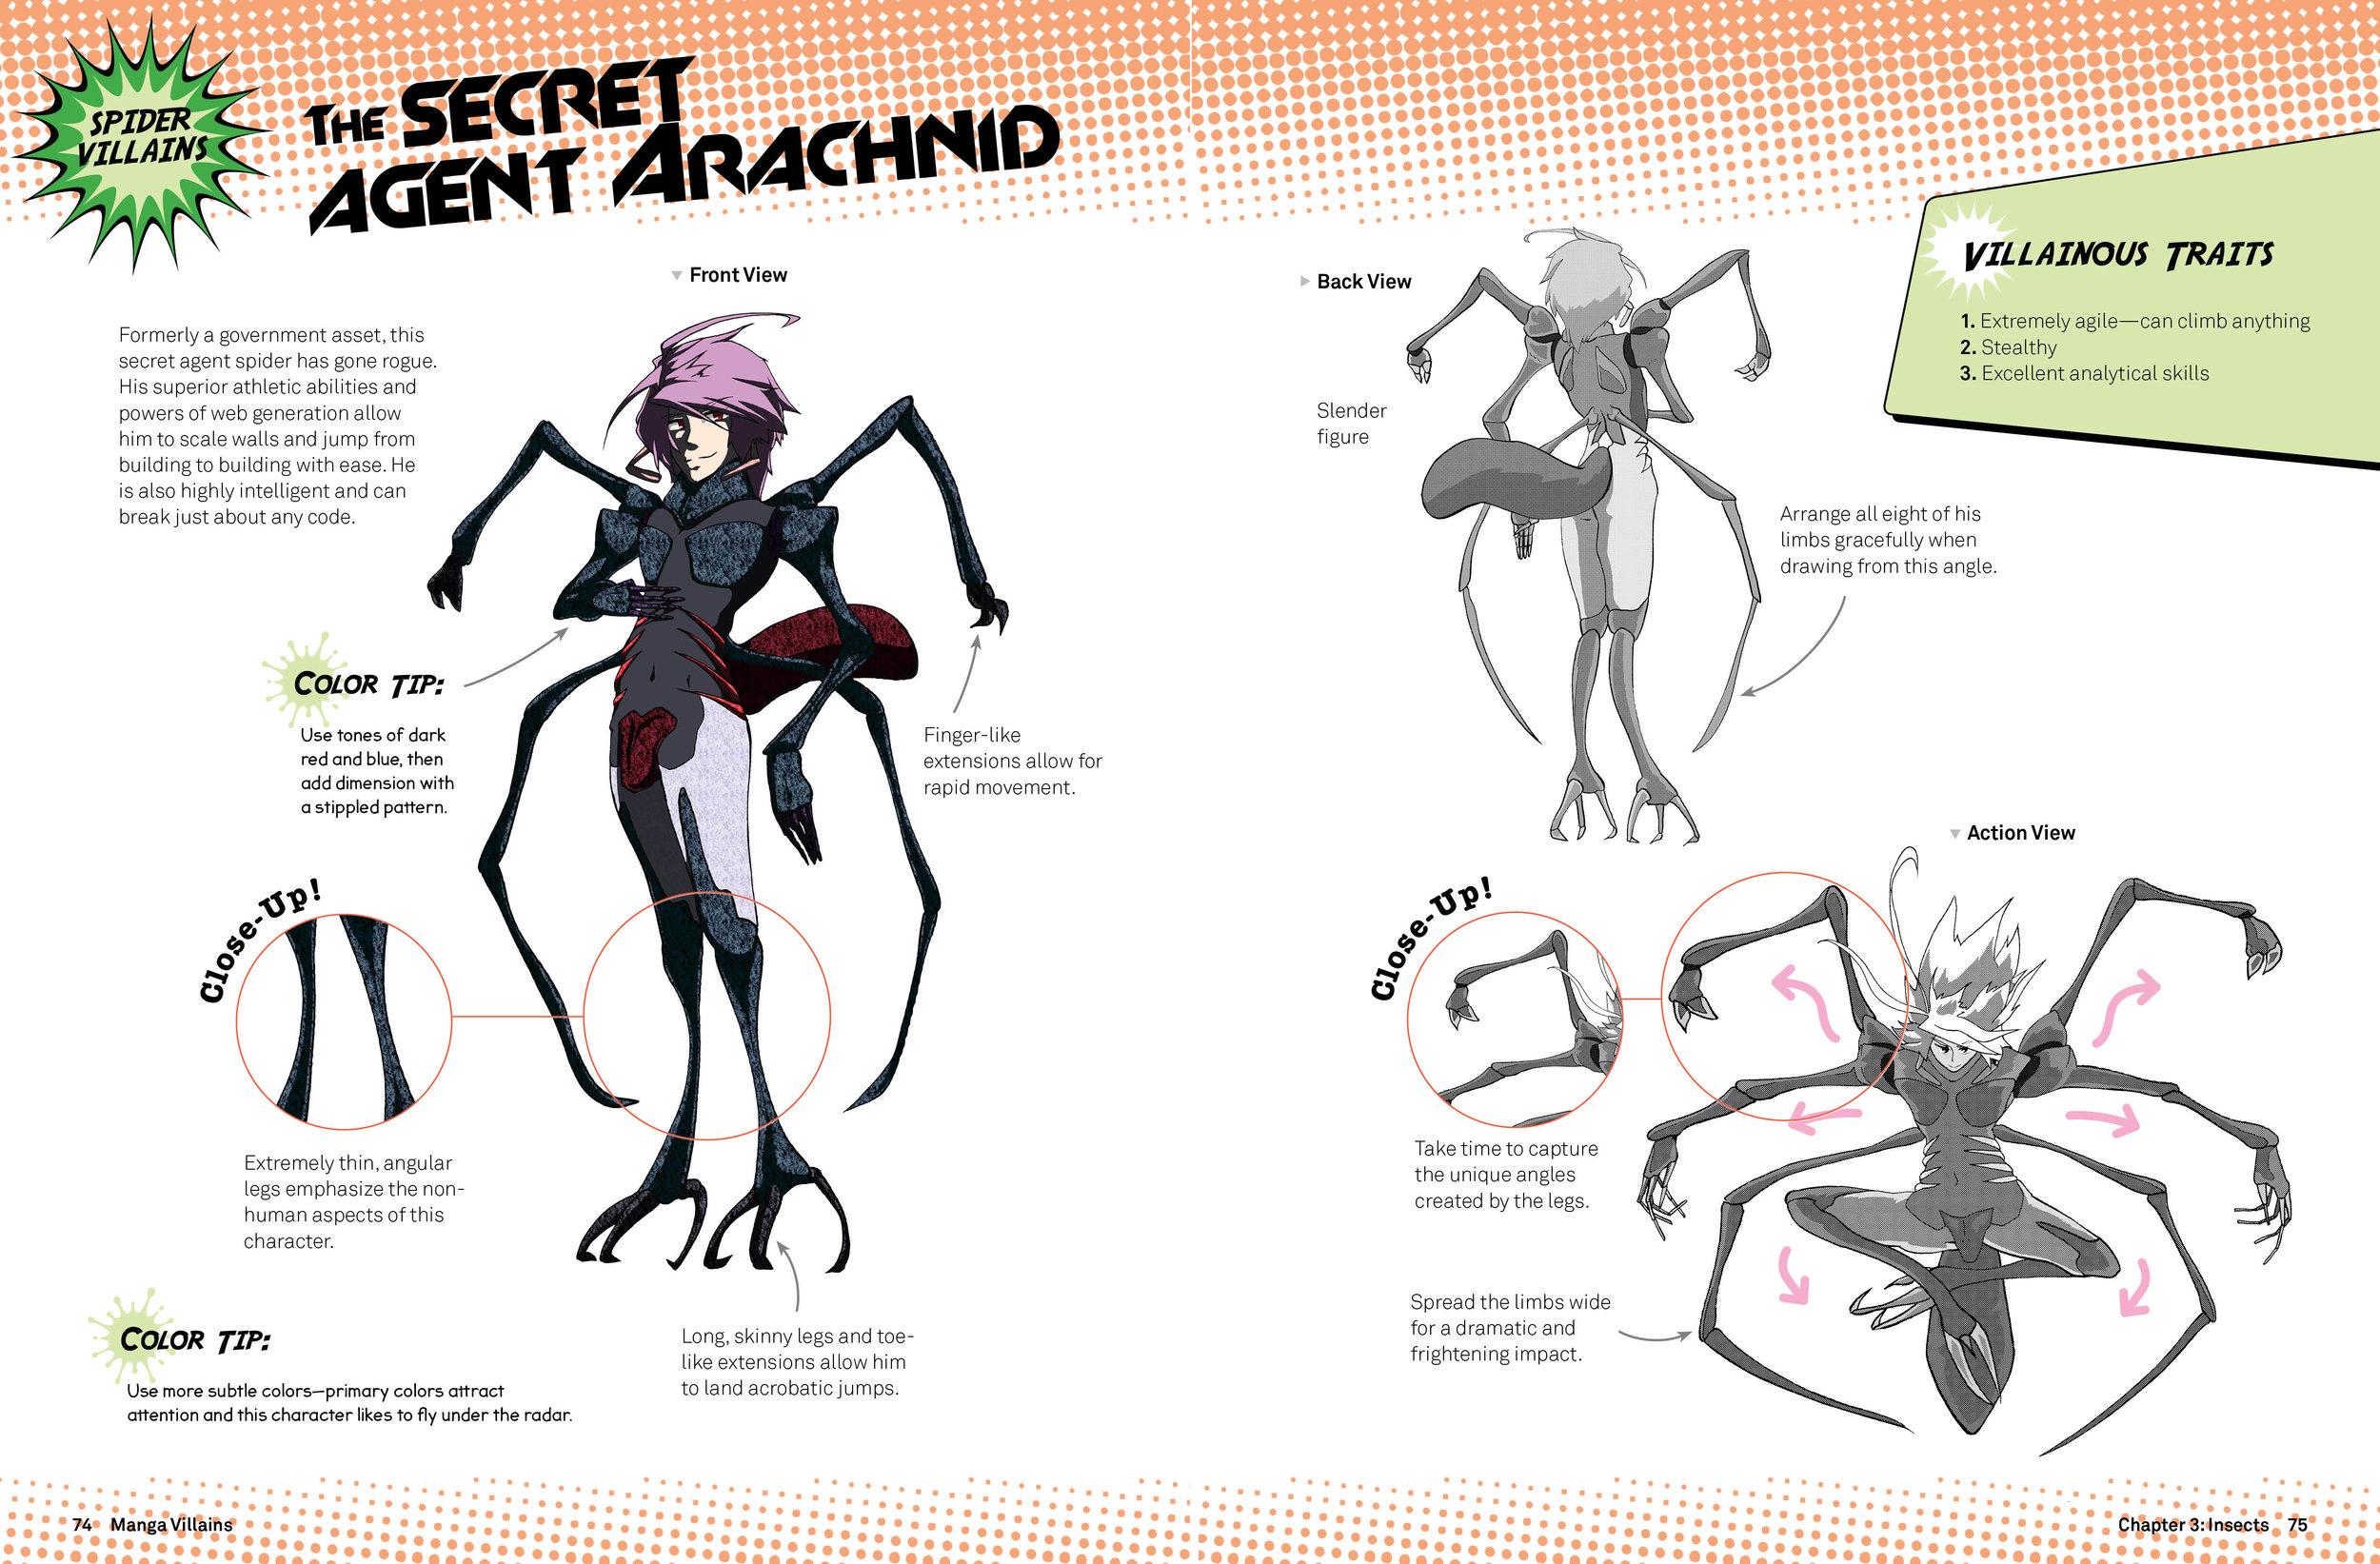 Draw Manga Villains 74.75.jpg